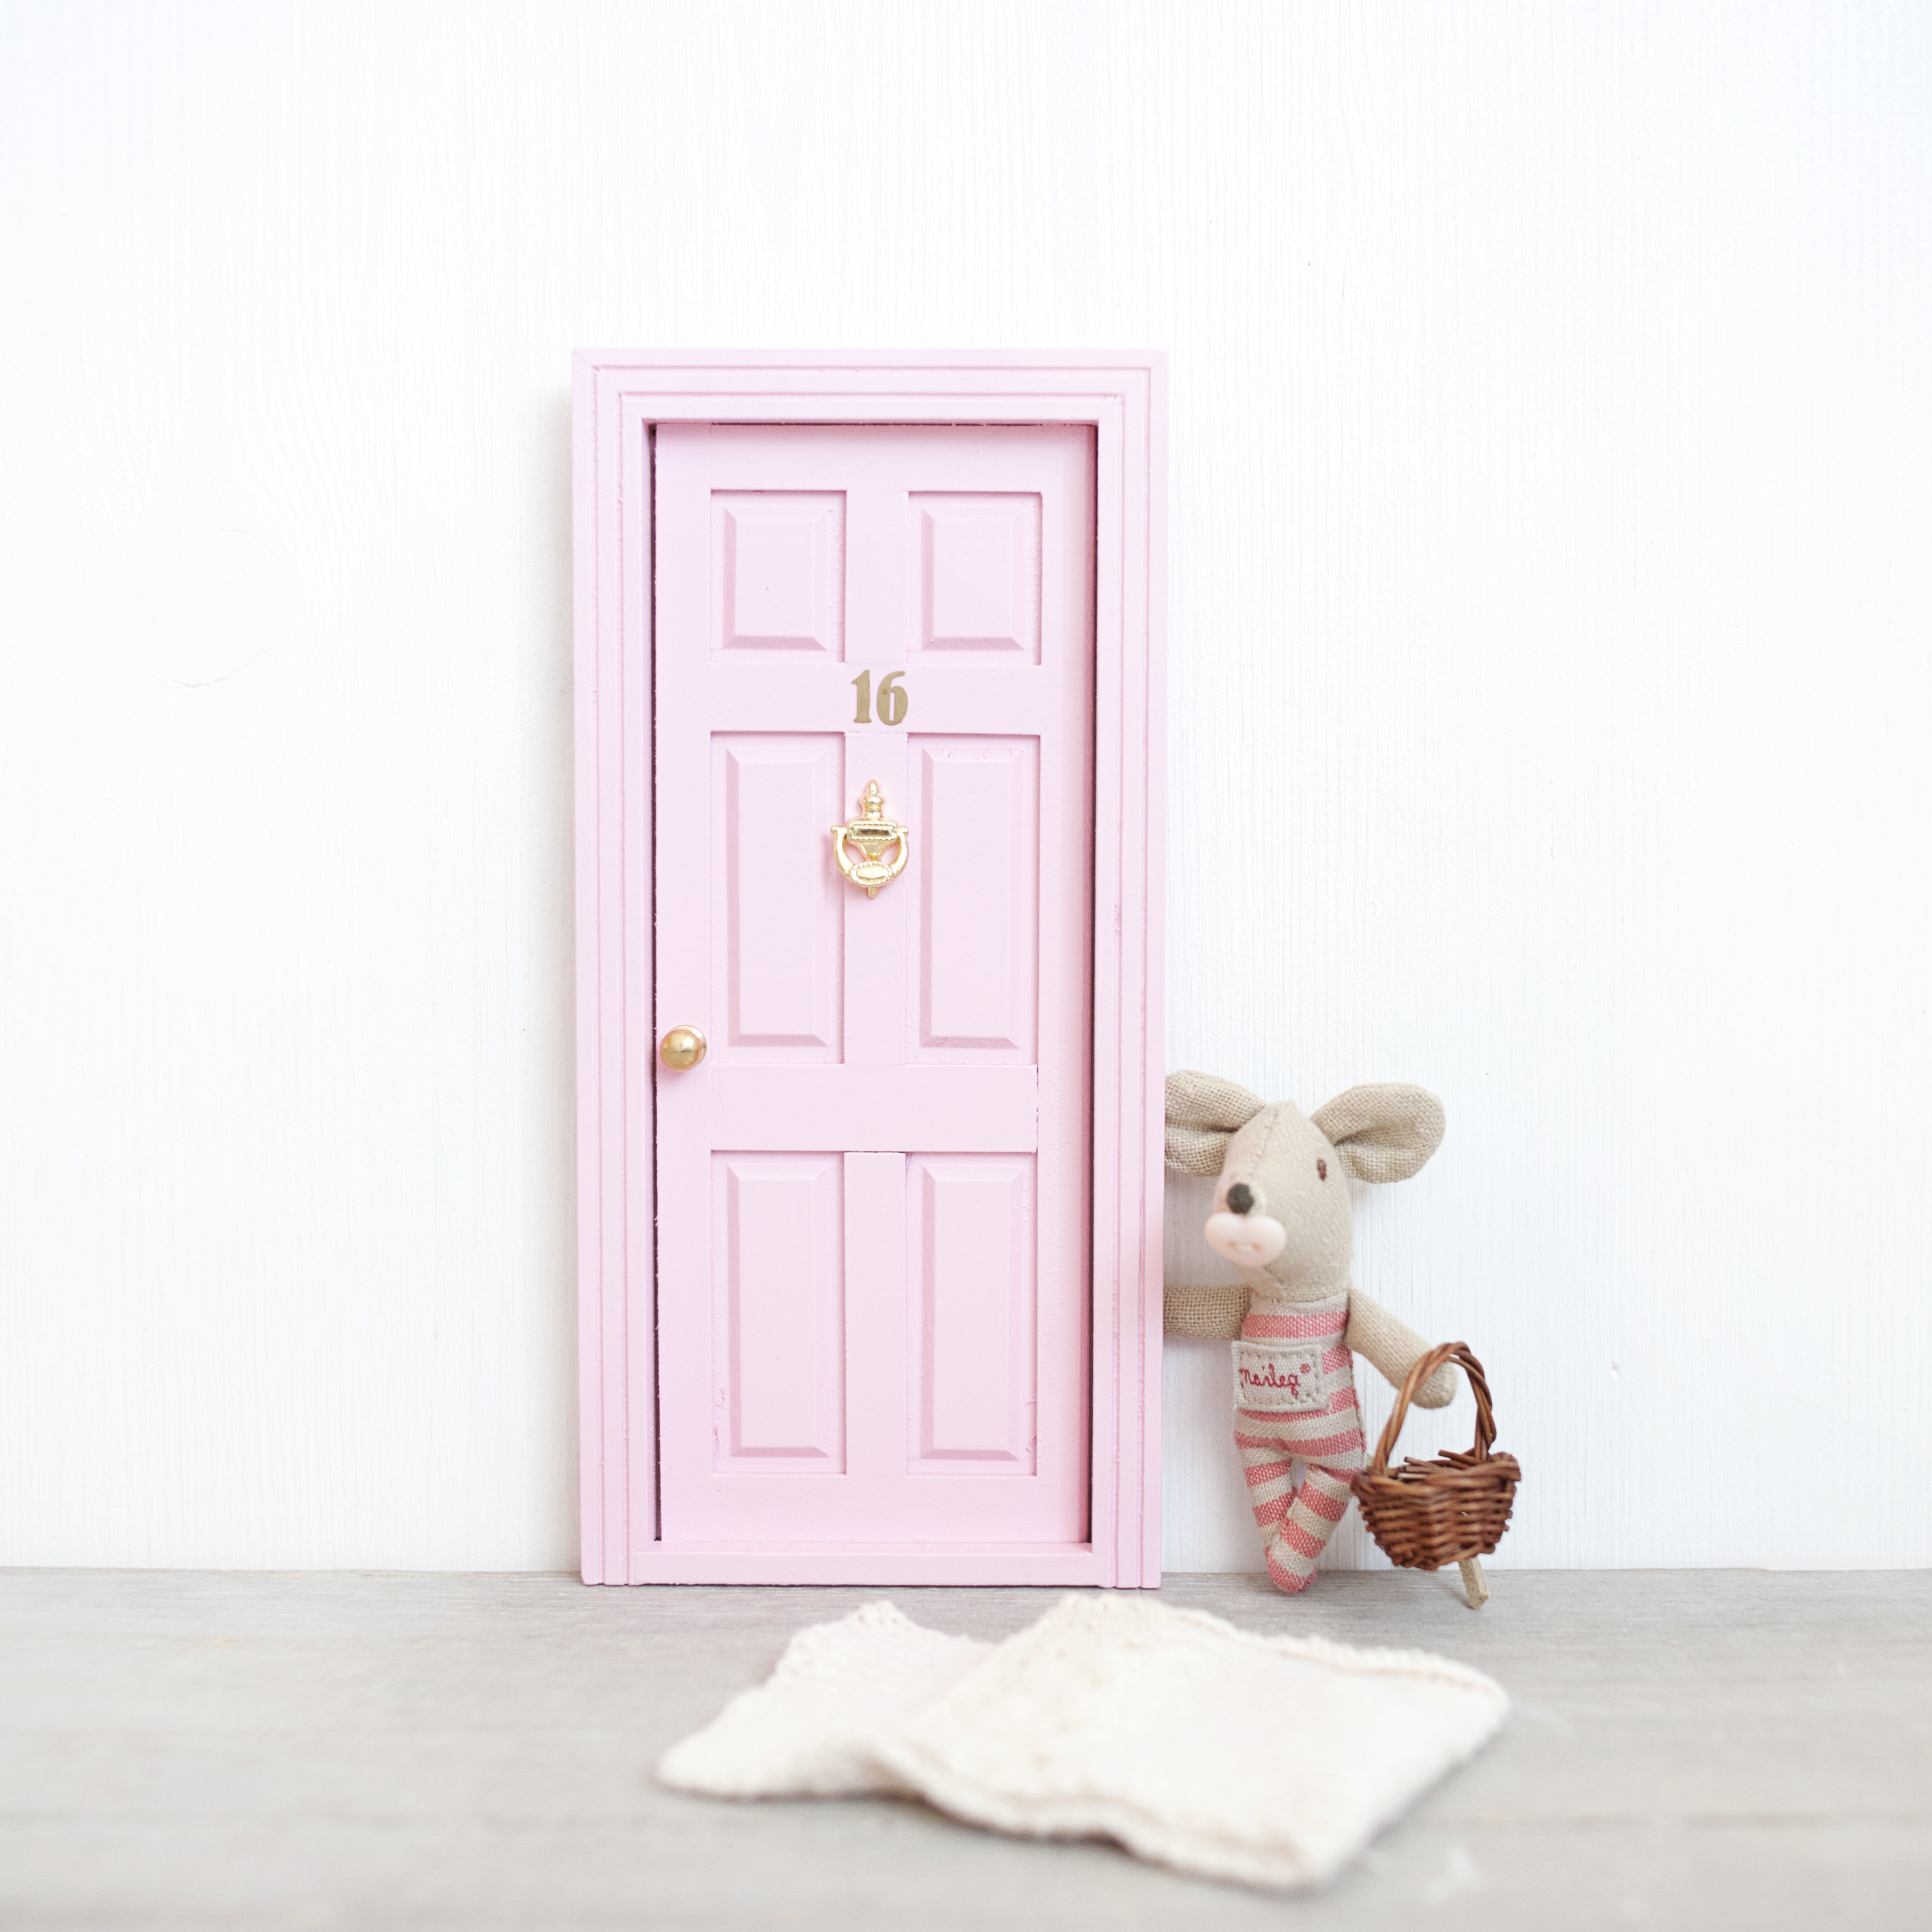 Puertas para el ratoncito p rez oui oui for Correo puerta a puerta